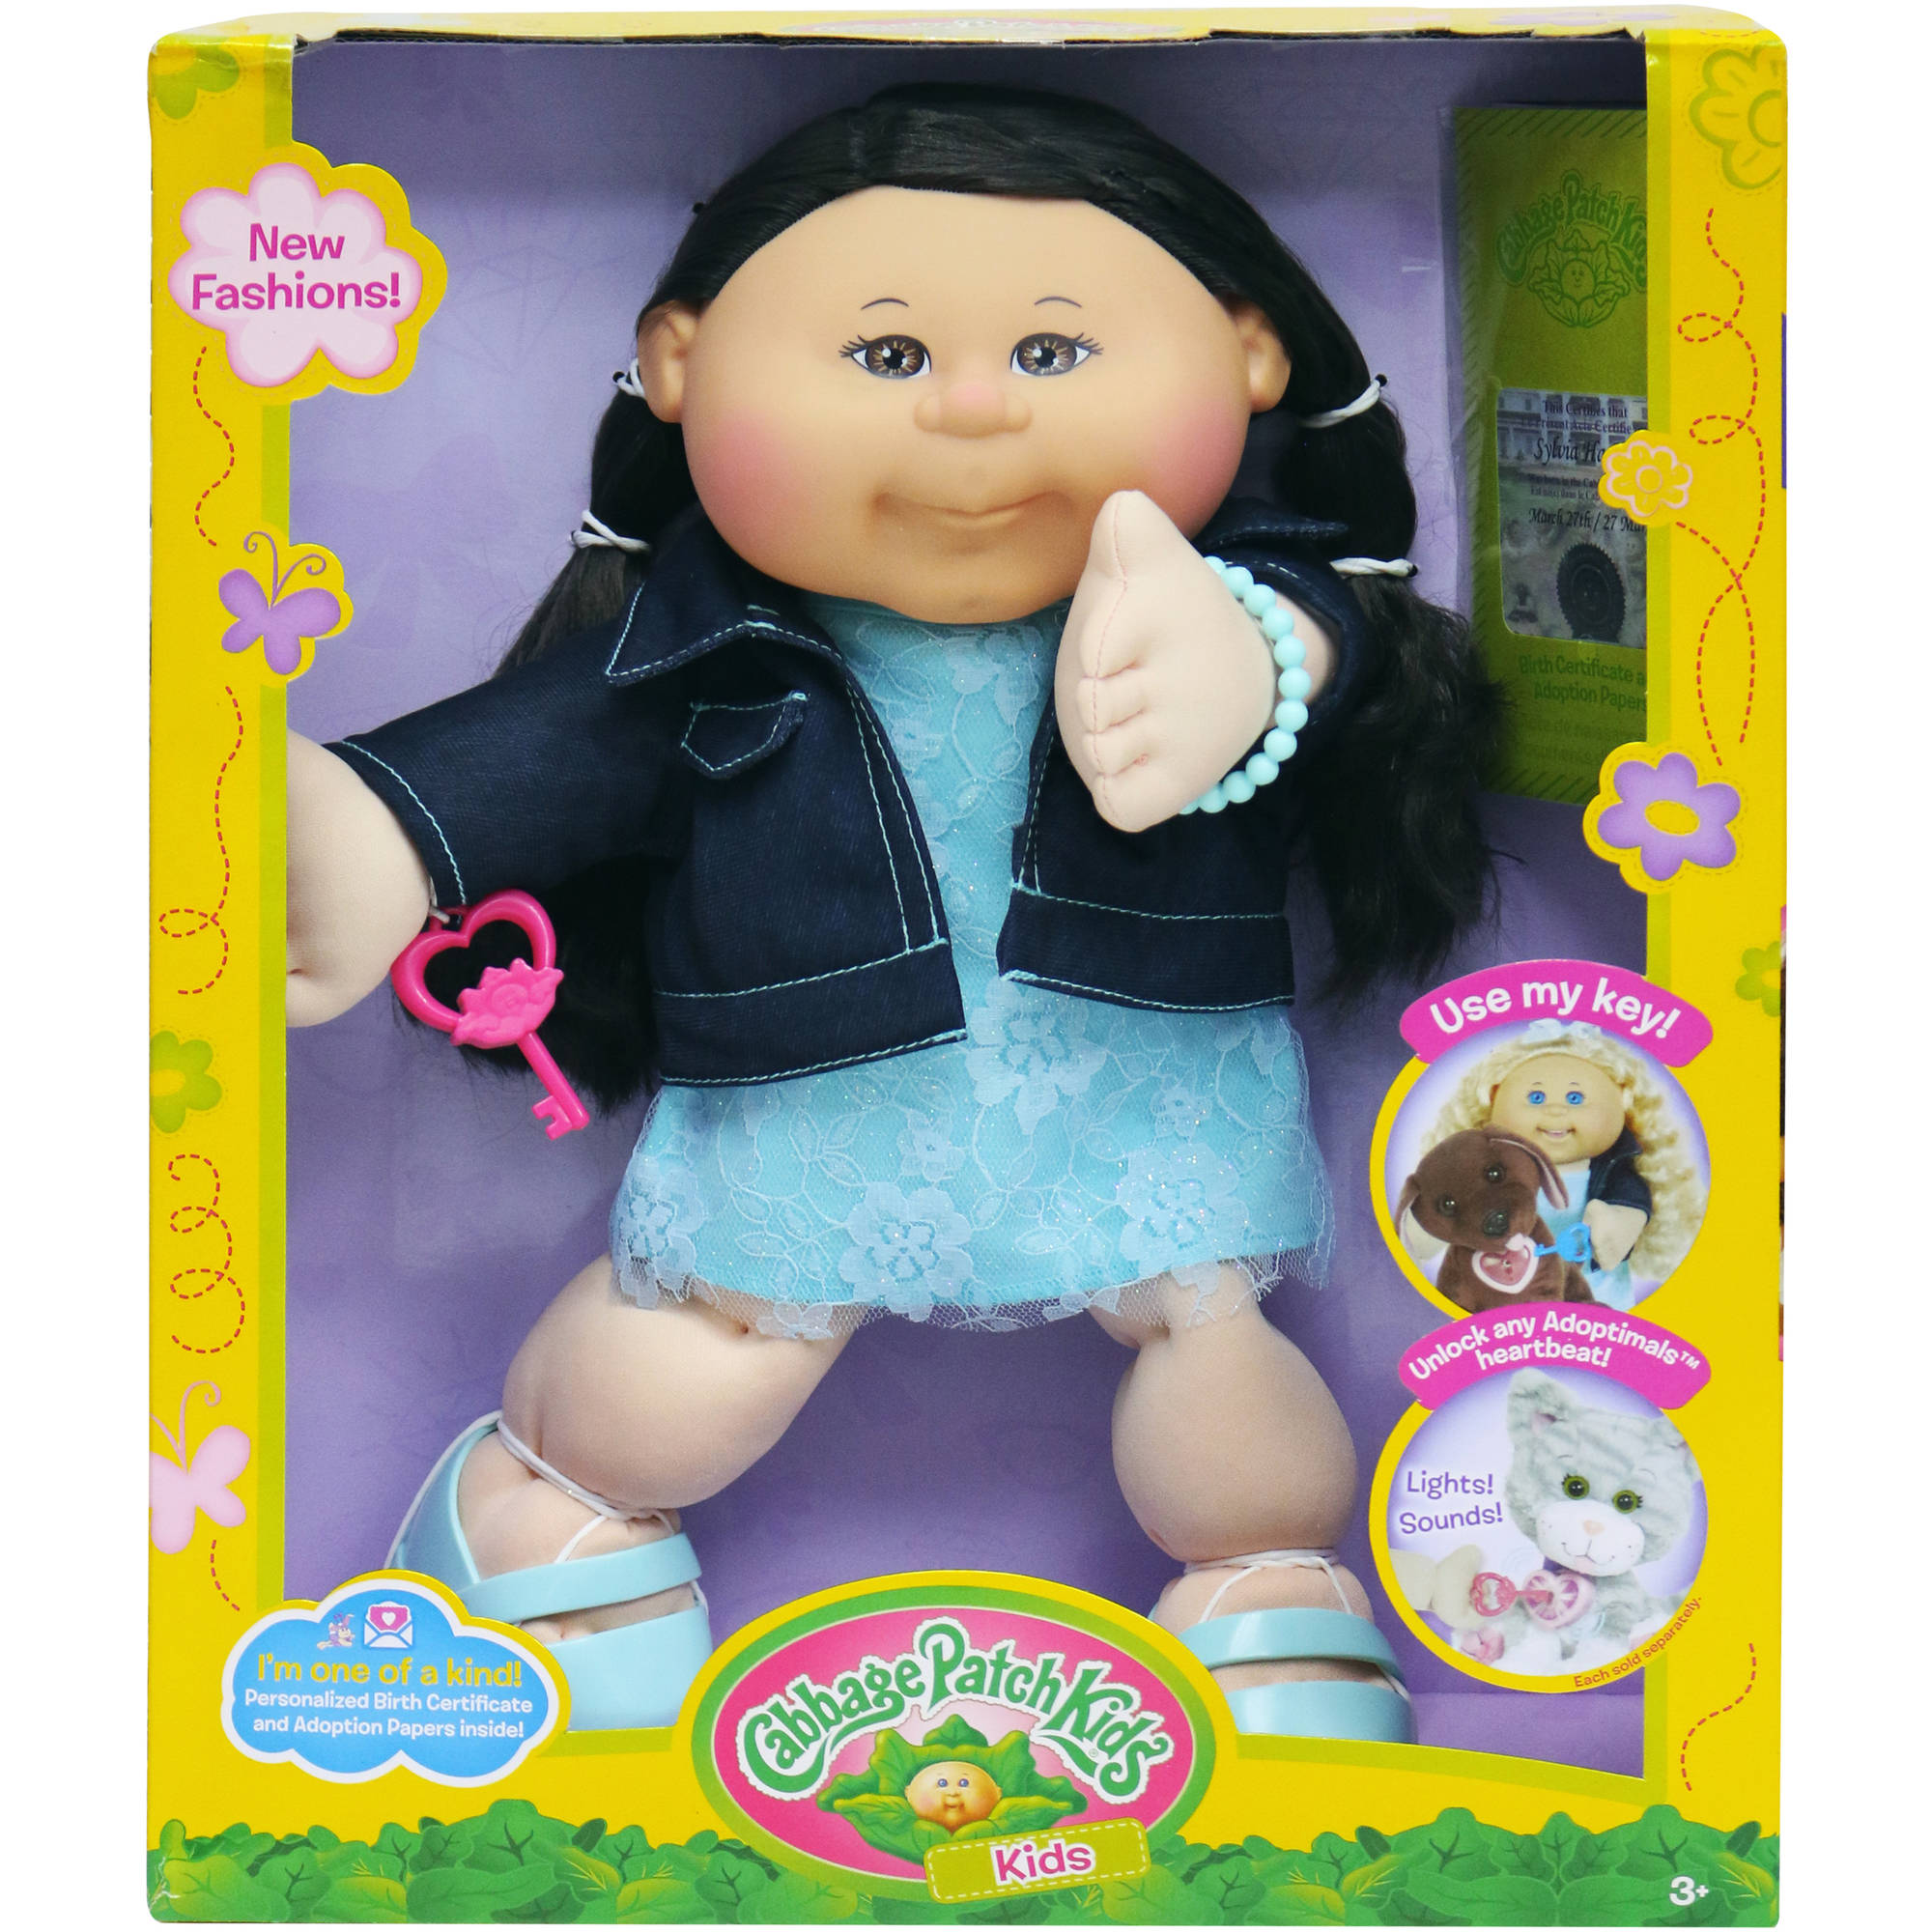 Cabbage Patch Kids Trendy Doll, Dark Hair/Brown Eye Girl